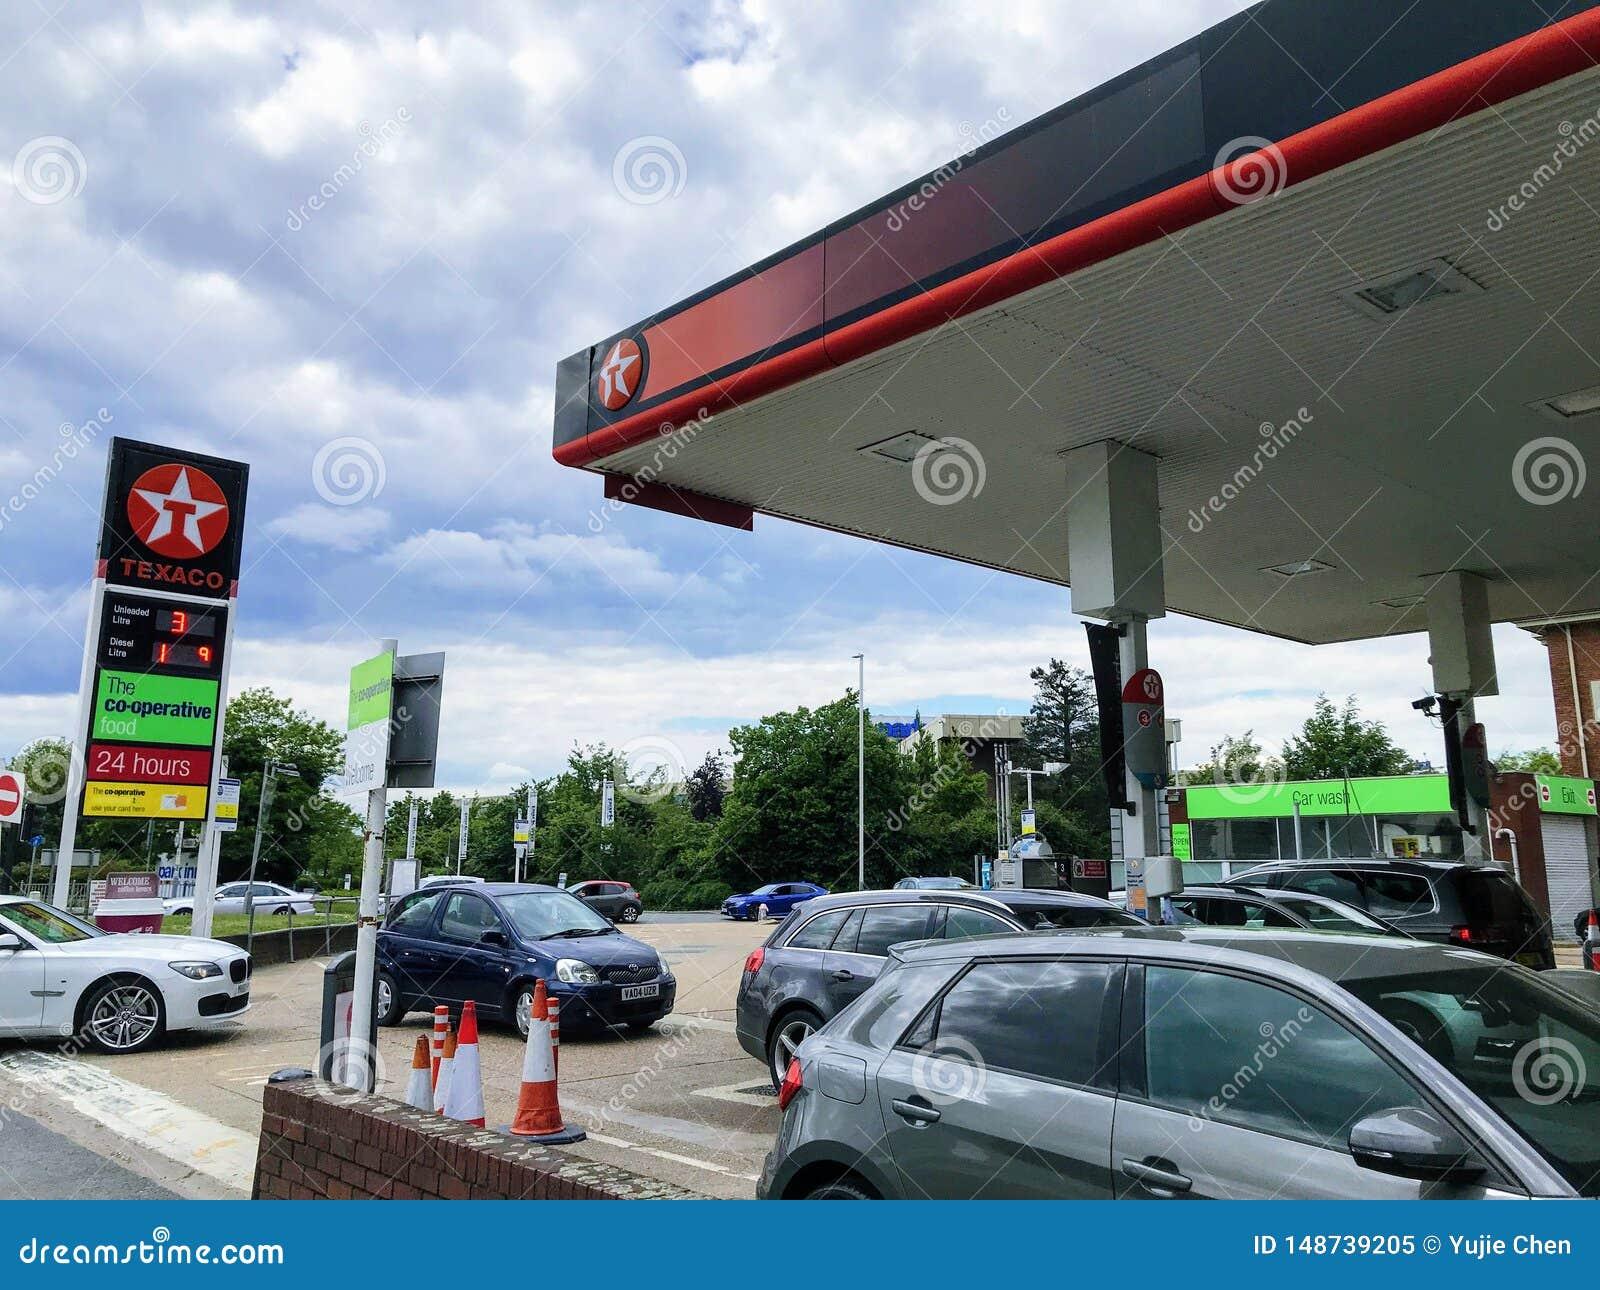 Texaco petrol station editorial image  Image of motor